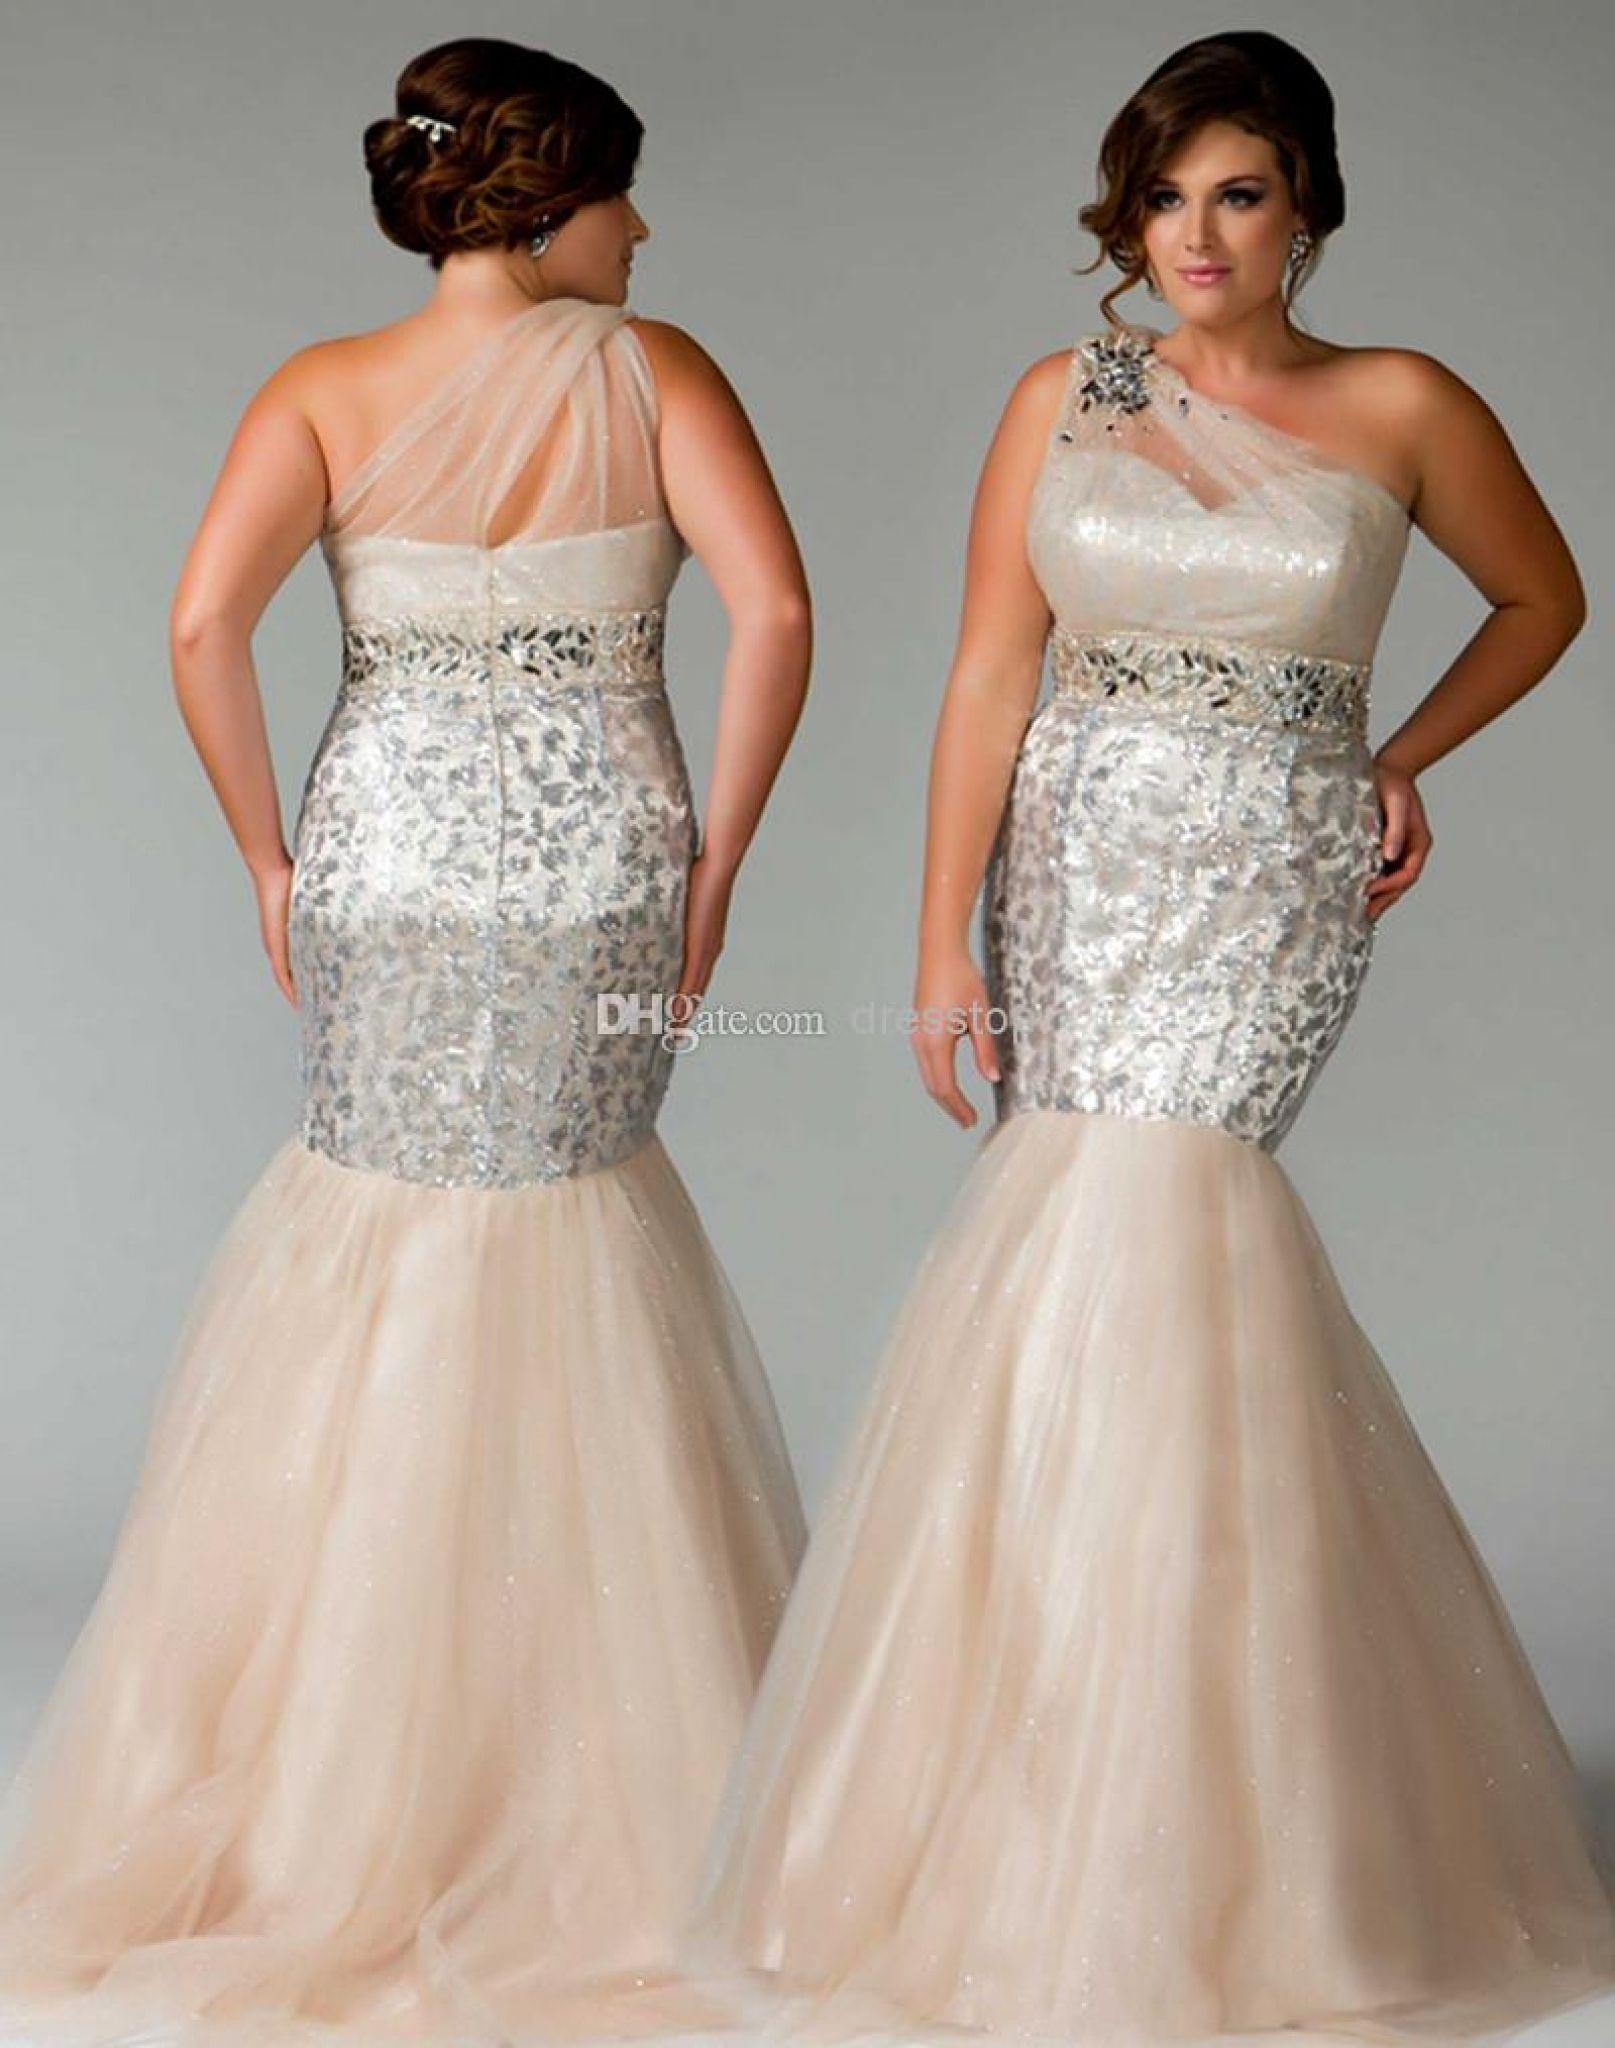 Plus Size Dress Champagne